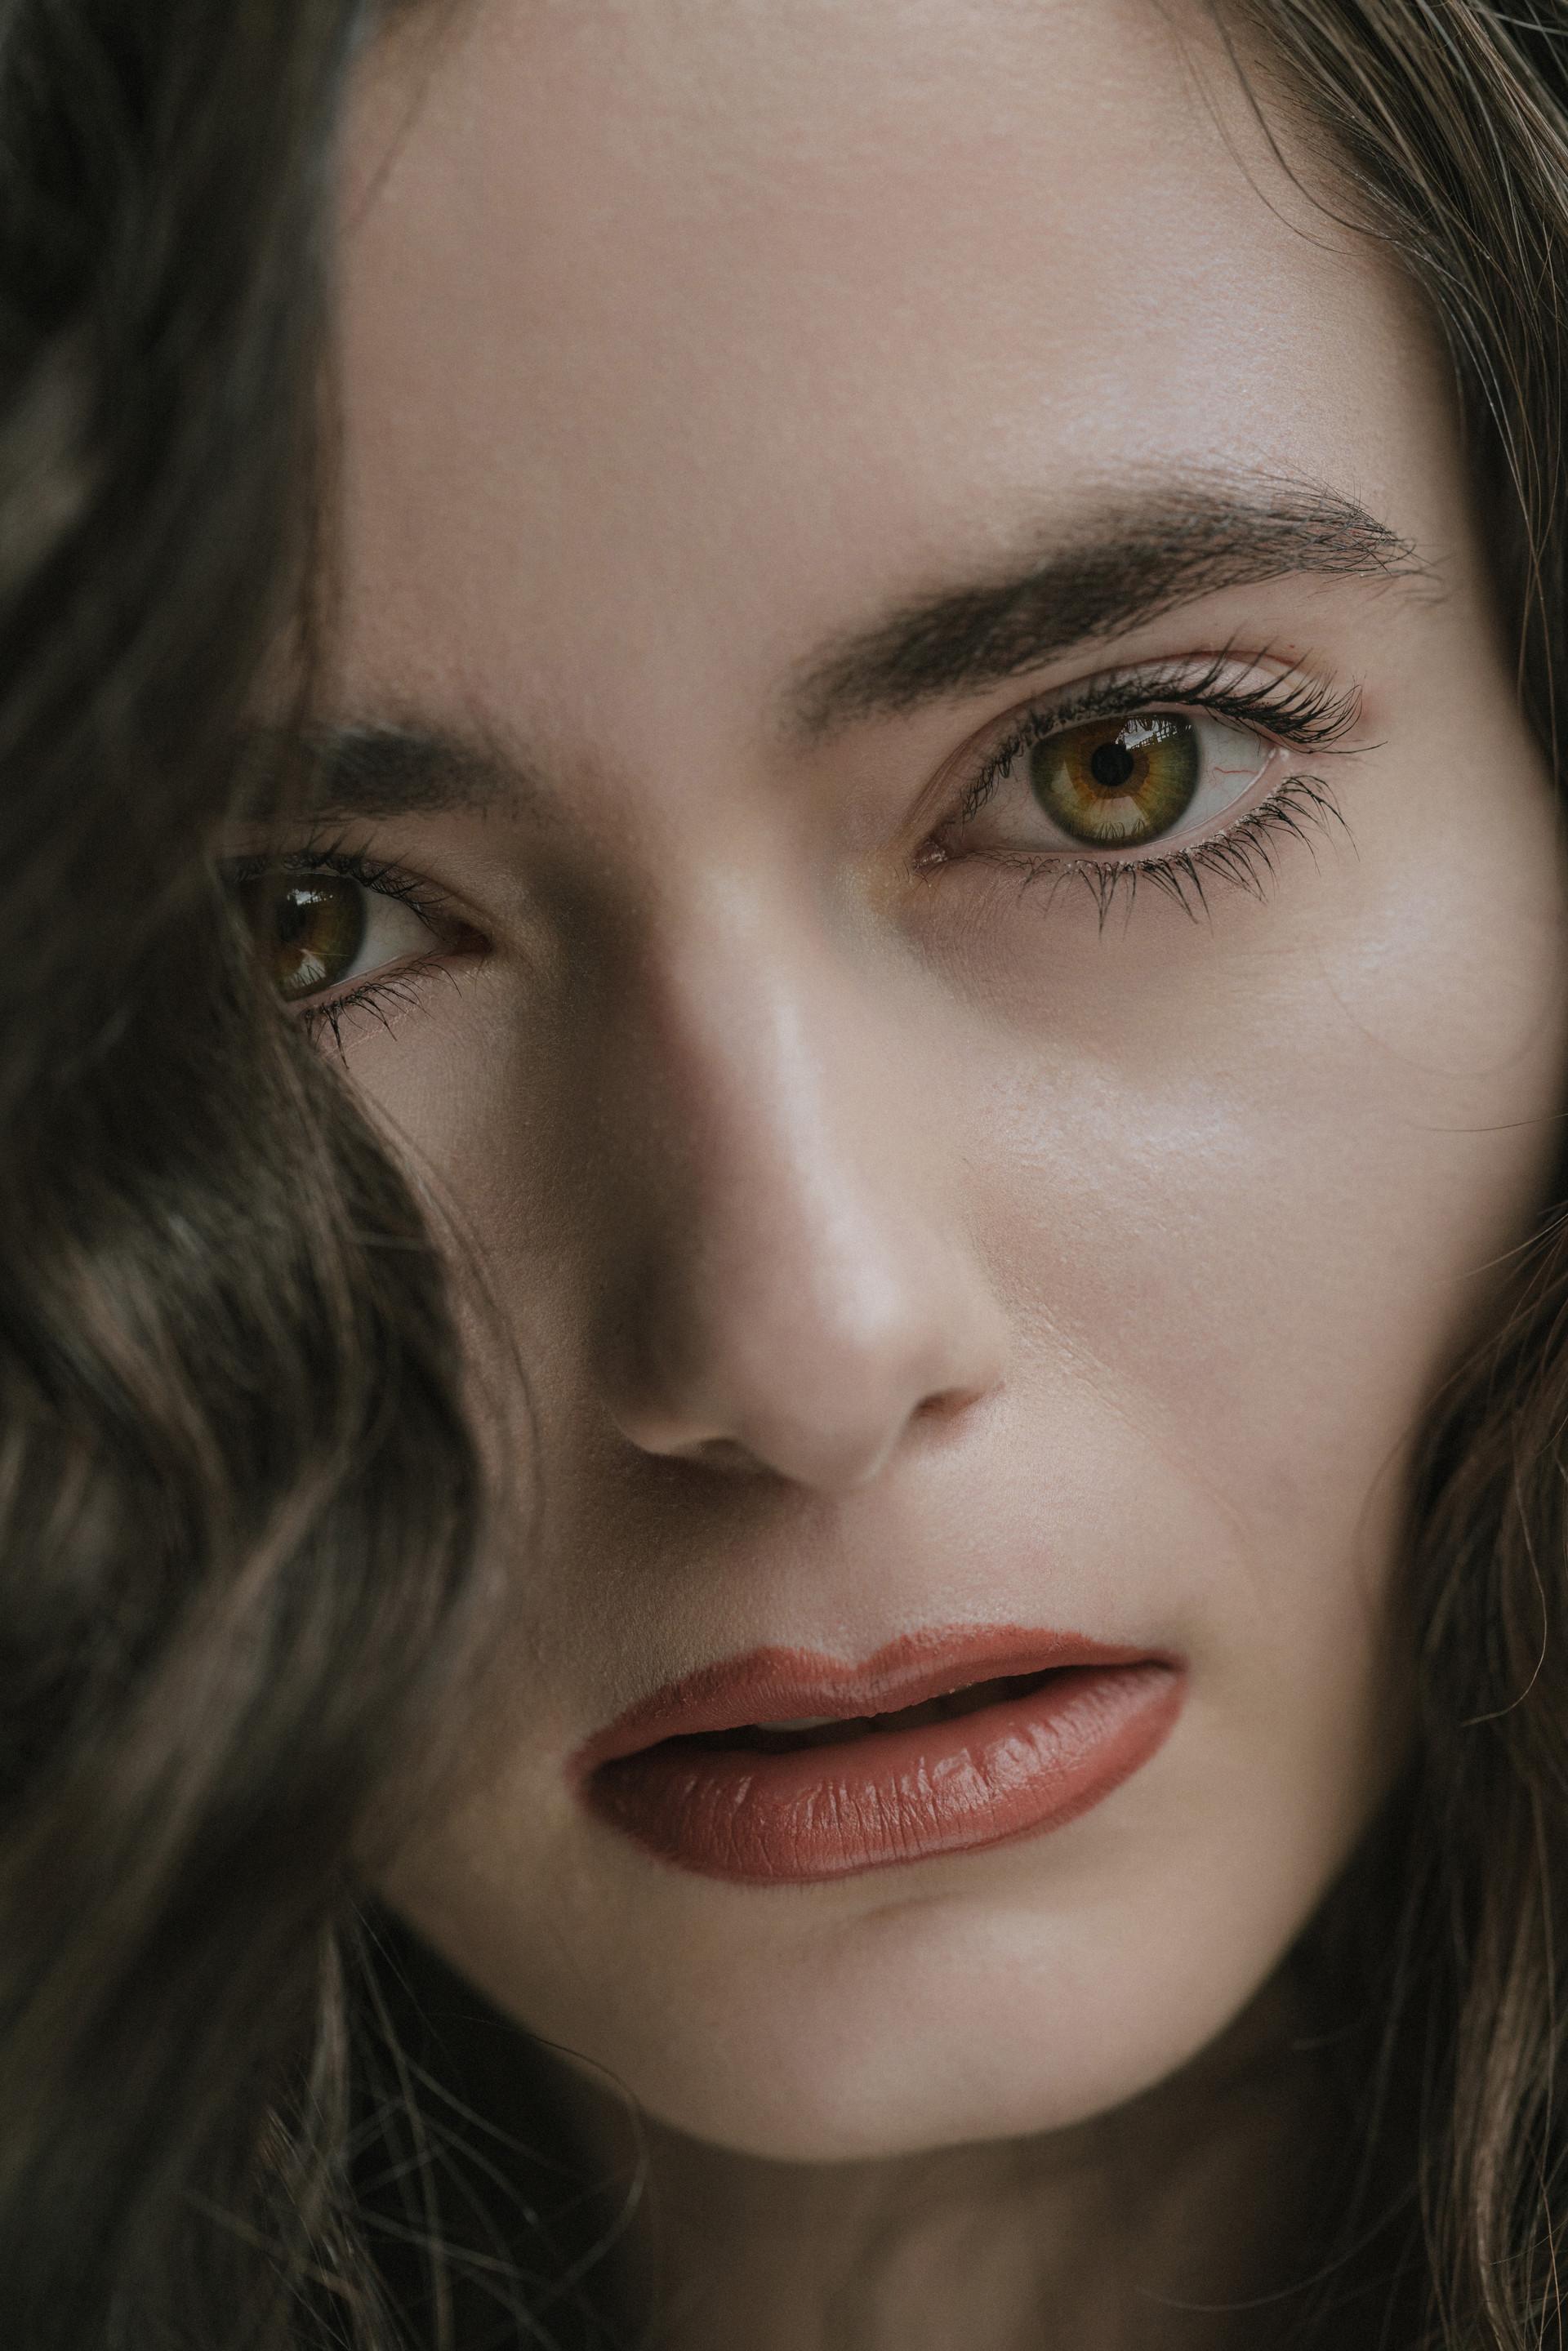 Photographer: Artu Nepomuceno Stylist: Meg Manzano Hairstylist: Mong Amado Model: Bronija Ales